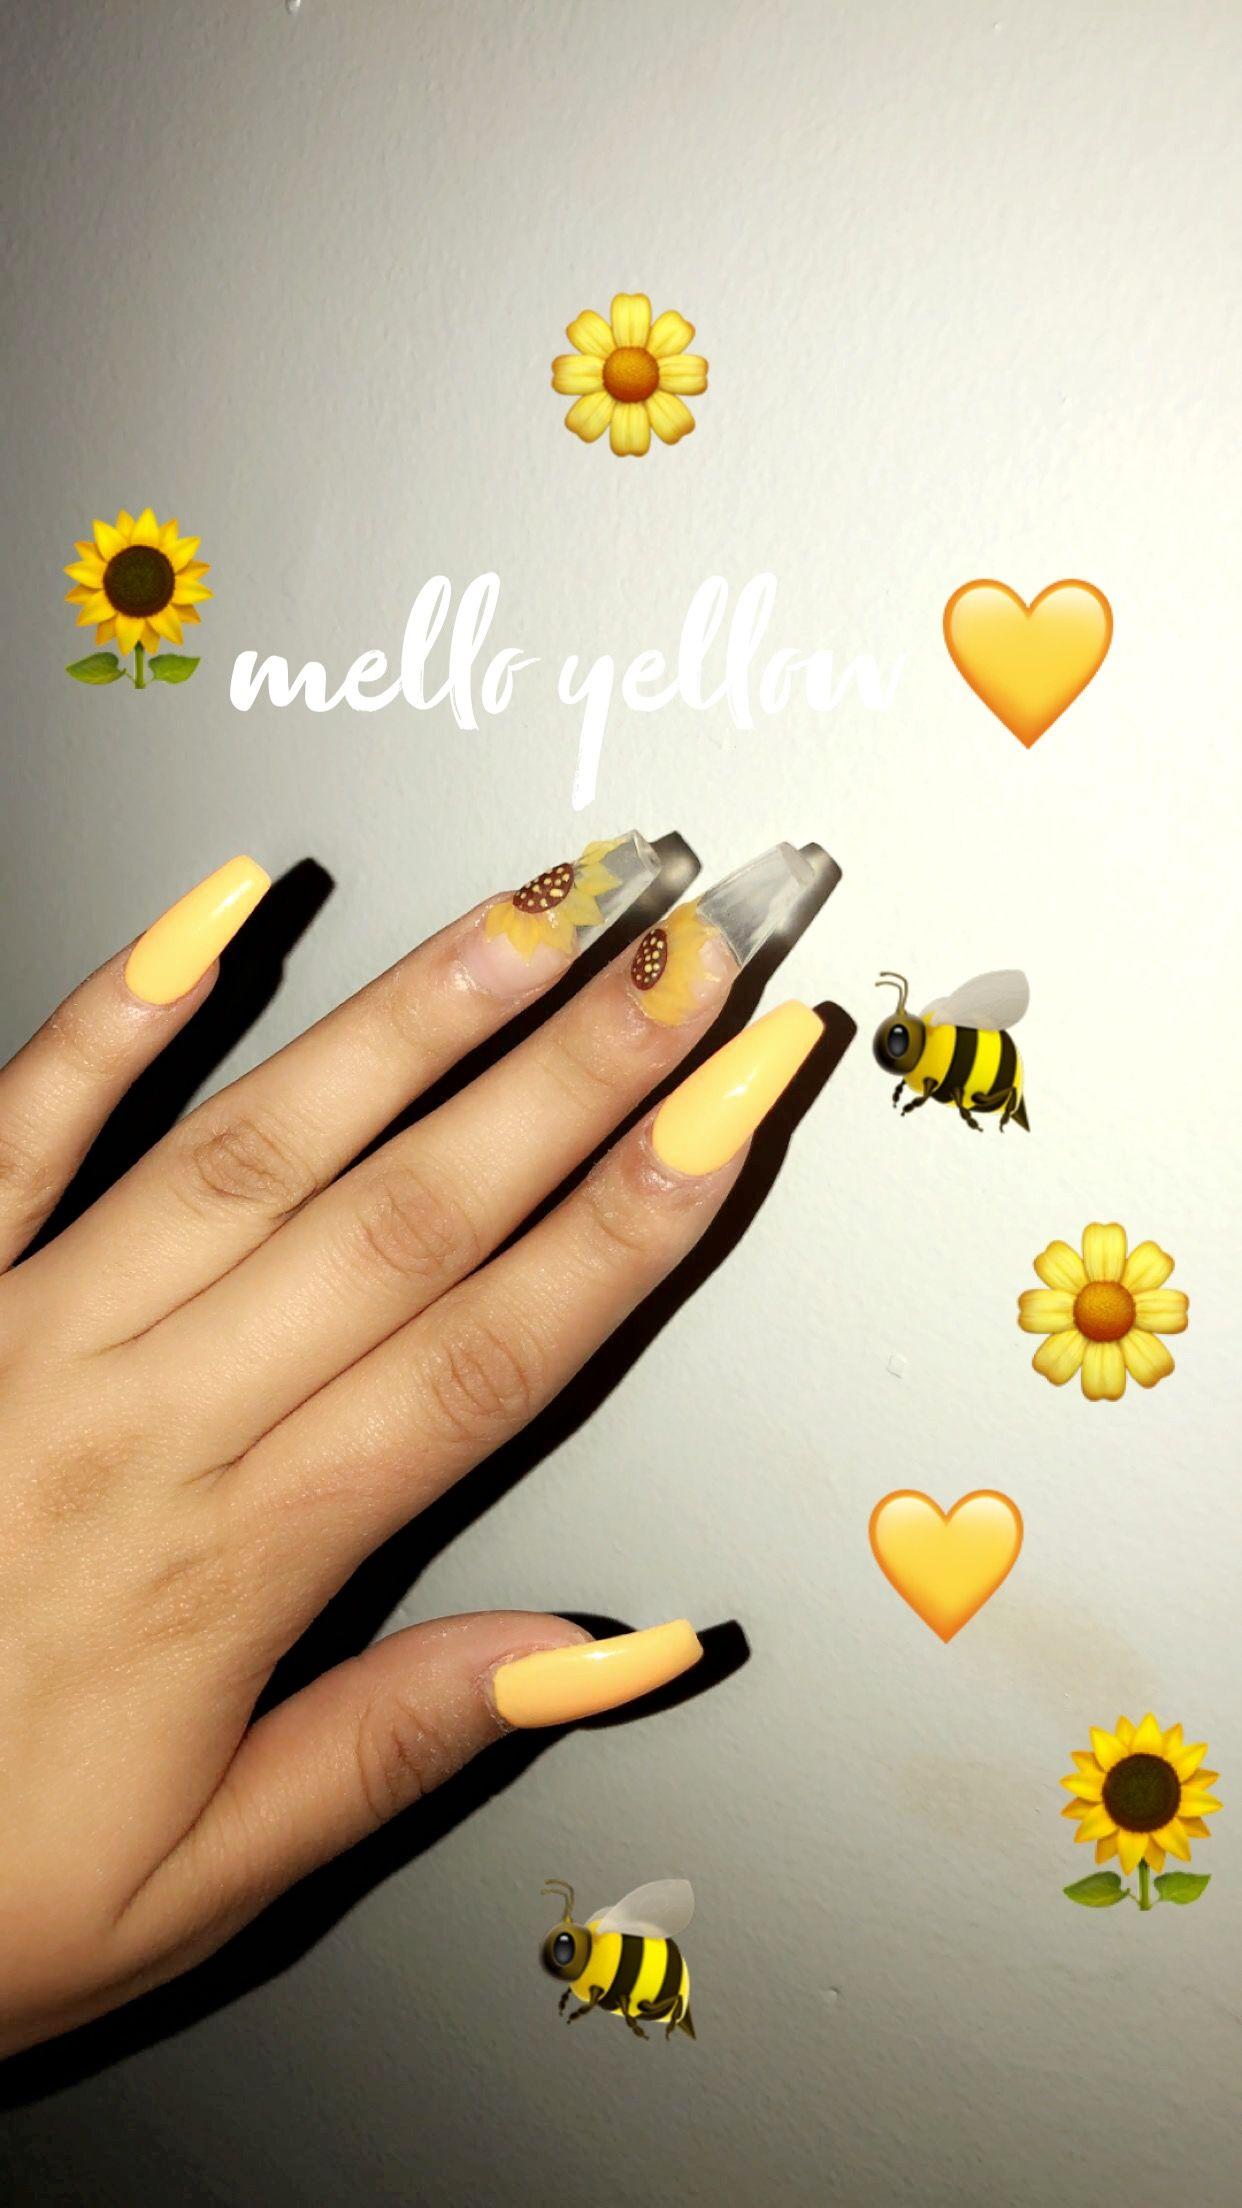 Yellow Sunflower Nails Nailart Acrylics Sunflower Yellow Nails Sunflower Nails Yellow Nails Prom Nails